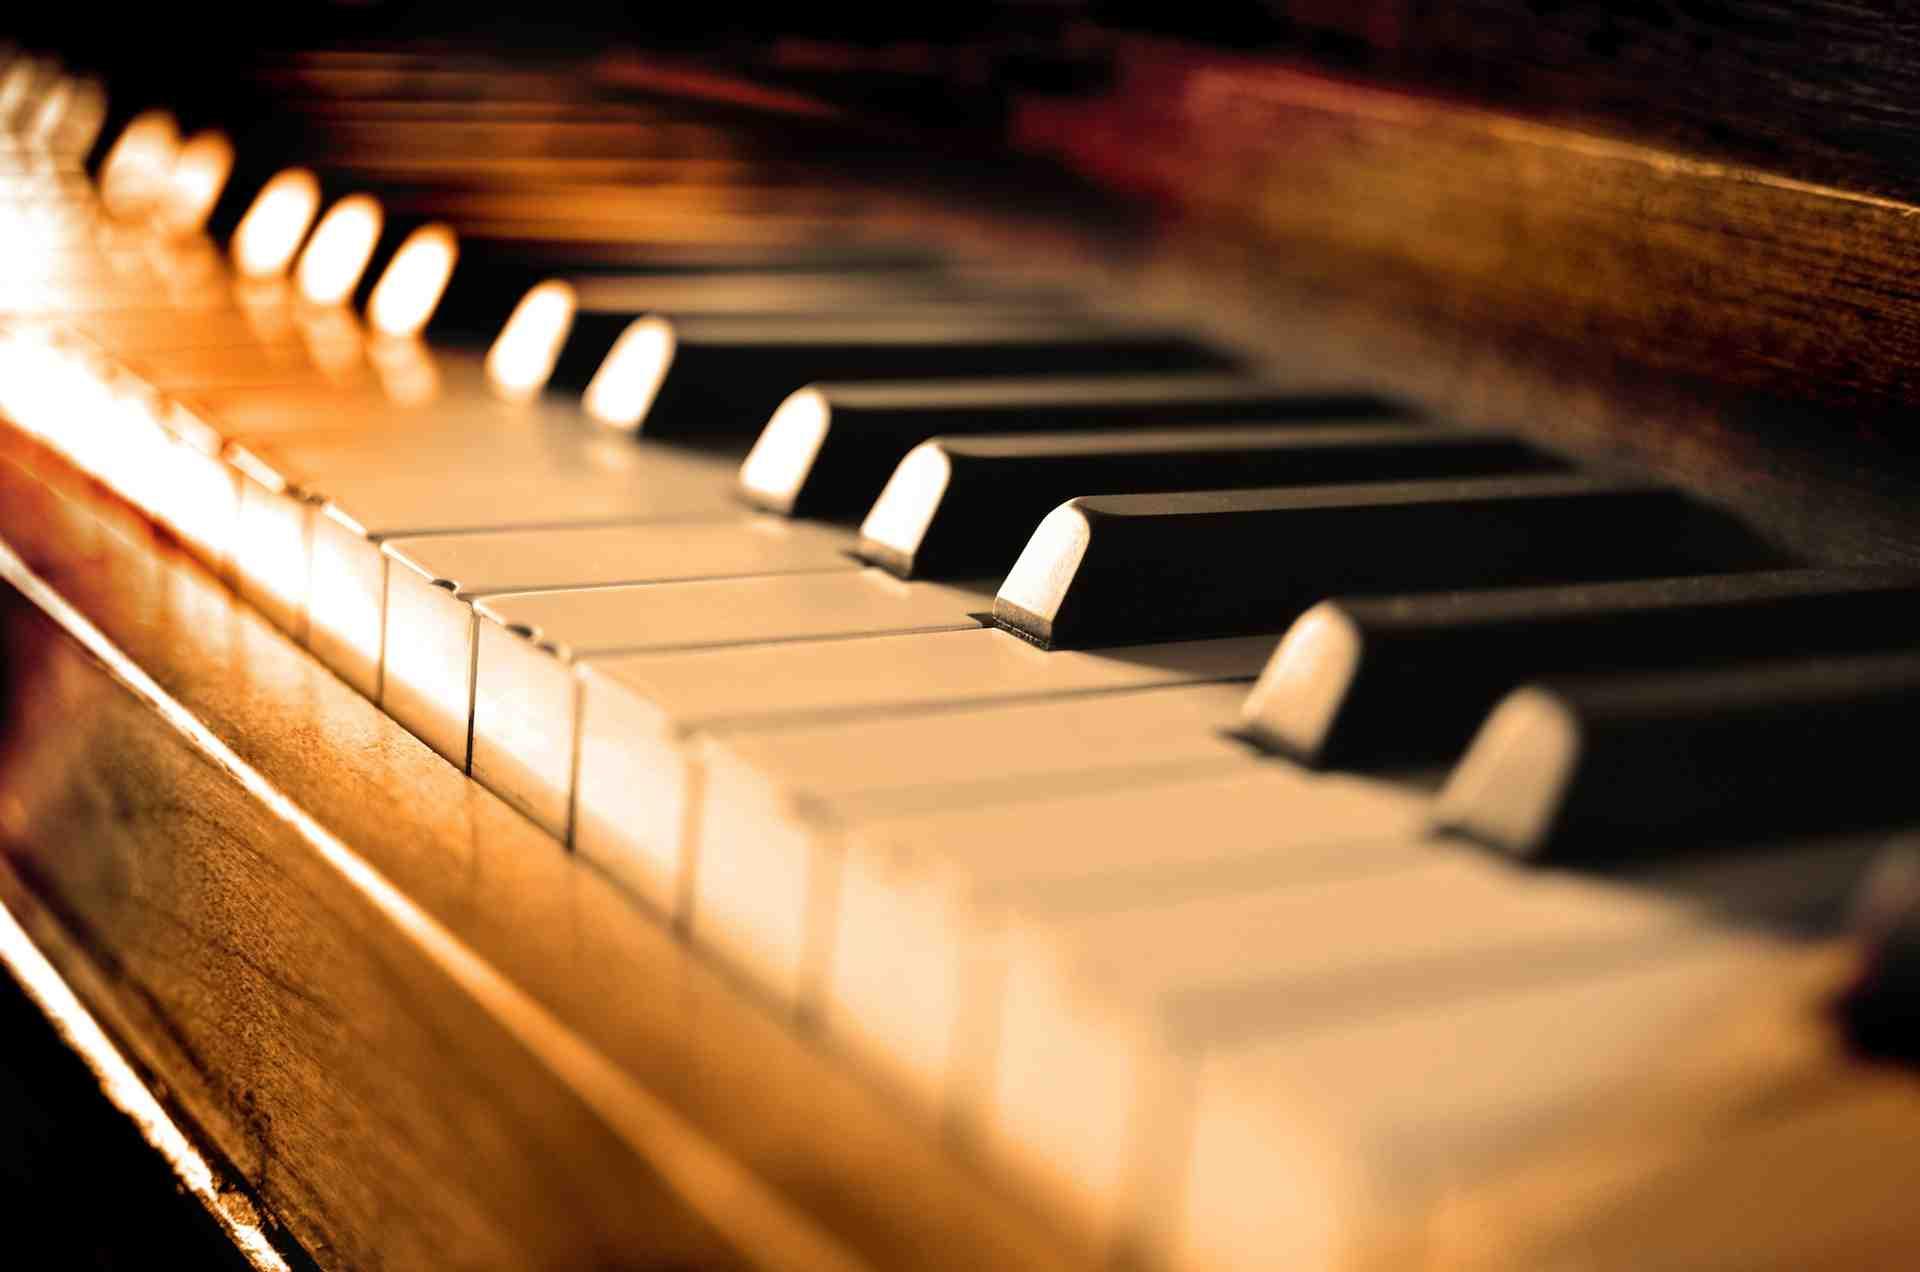 La belleza de la música